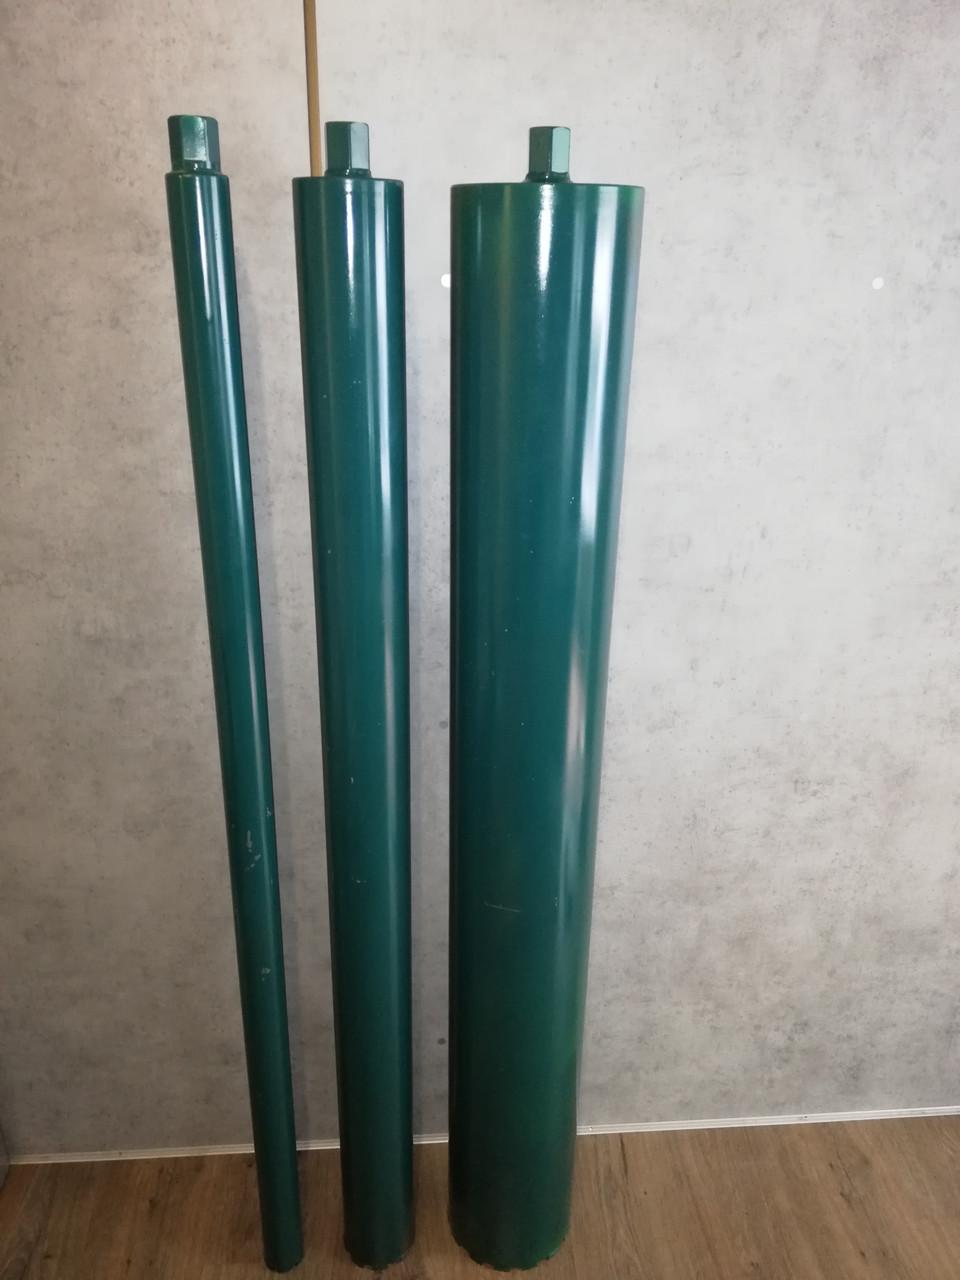 Алмазная коронка Almaz Group Ø 62 мм L 1500 мм сегмент по железобетону